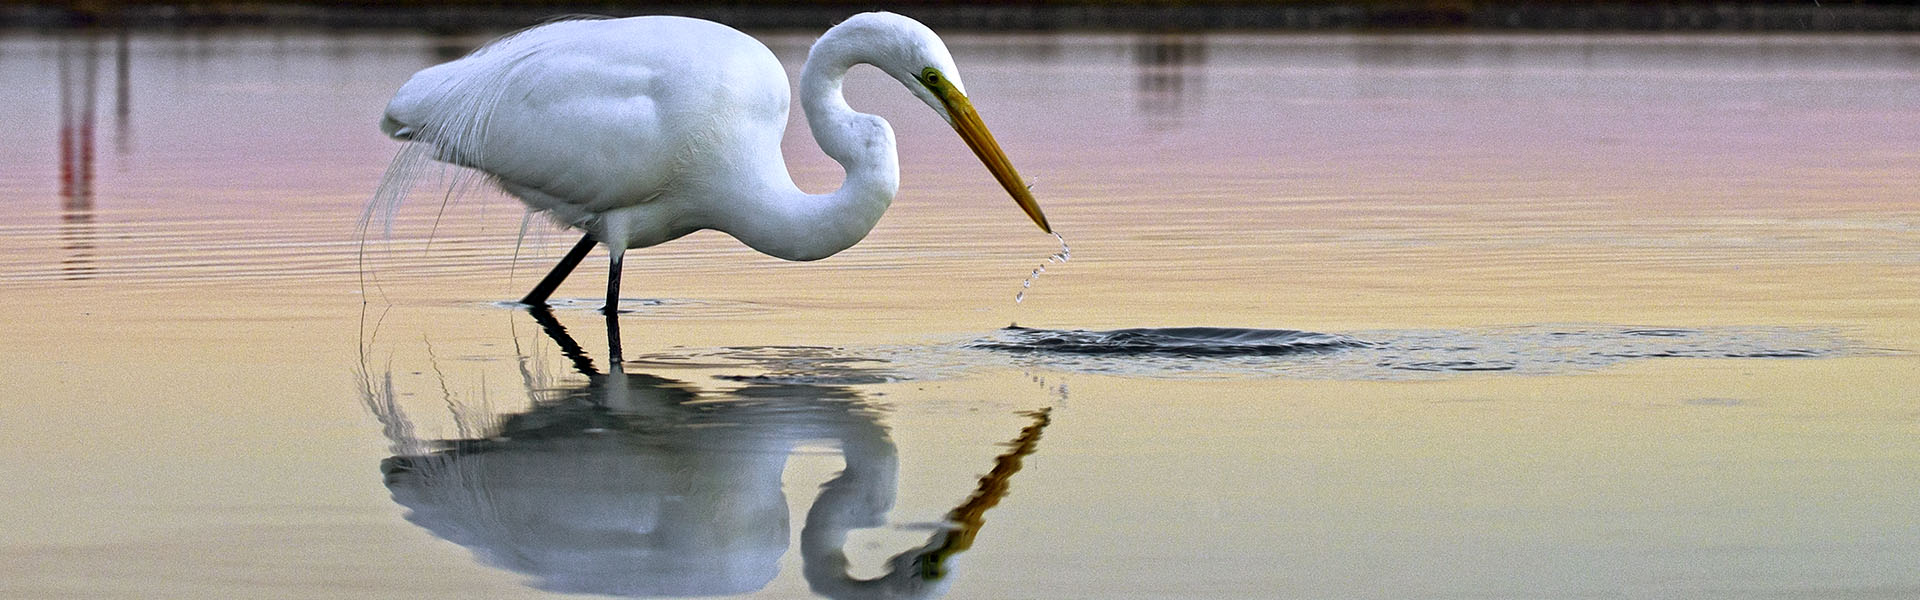 Egret Hunting in Wetland